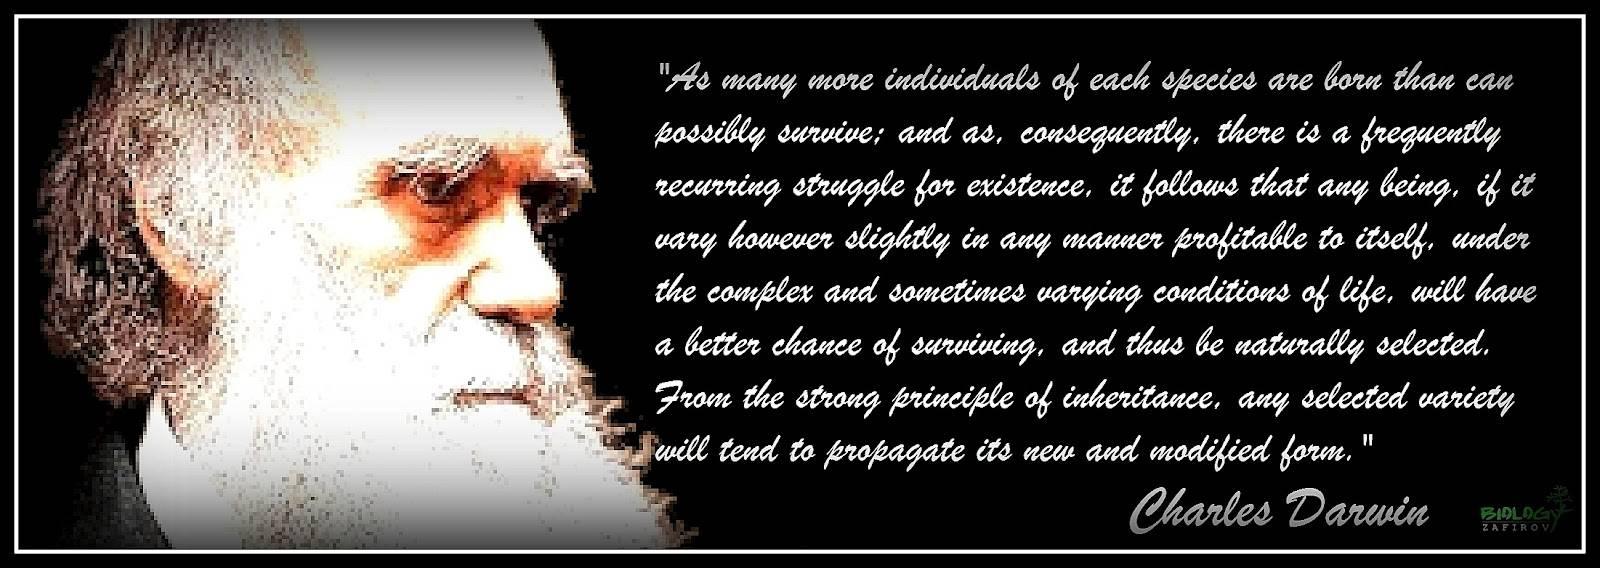 Quotes About Evolution. QuotesGram